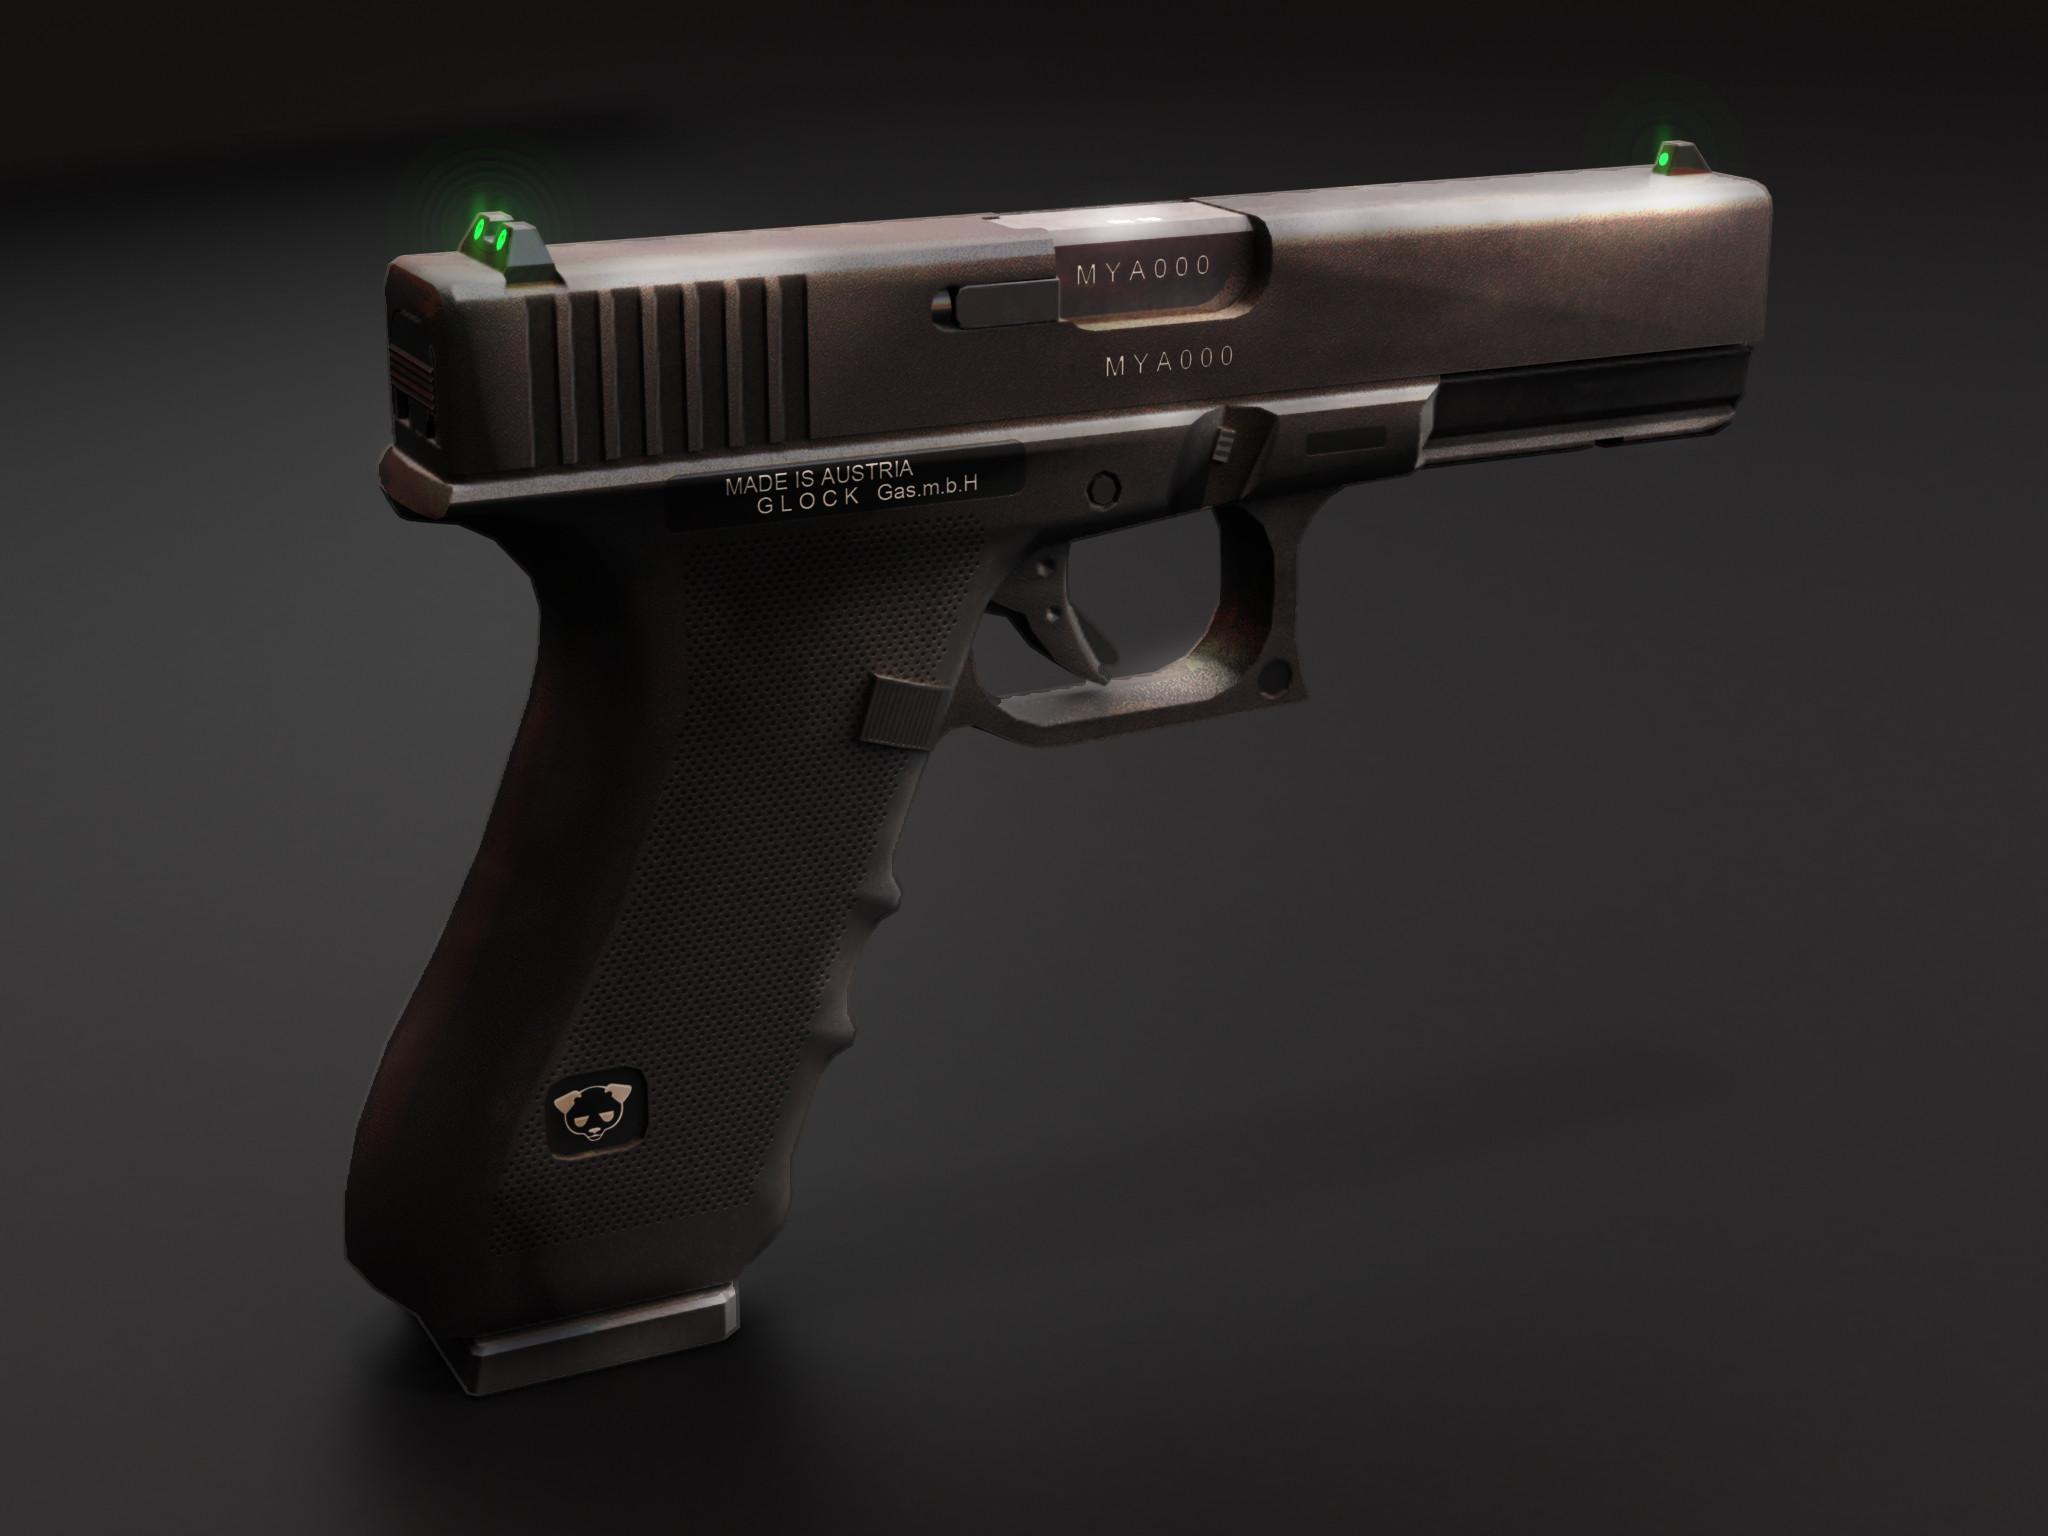 Res: 2048x1536, Glock 17 by TheBadPanda2 Glock 17 by TheBadPanda2